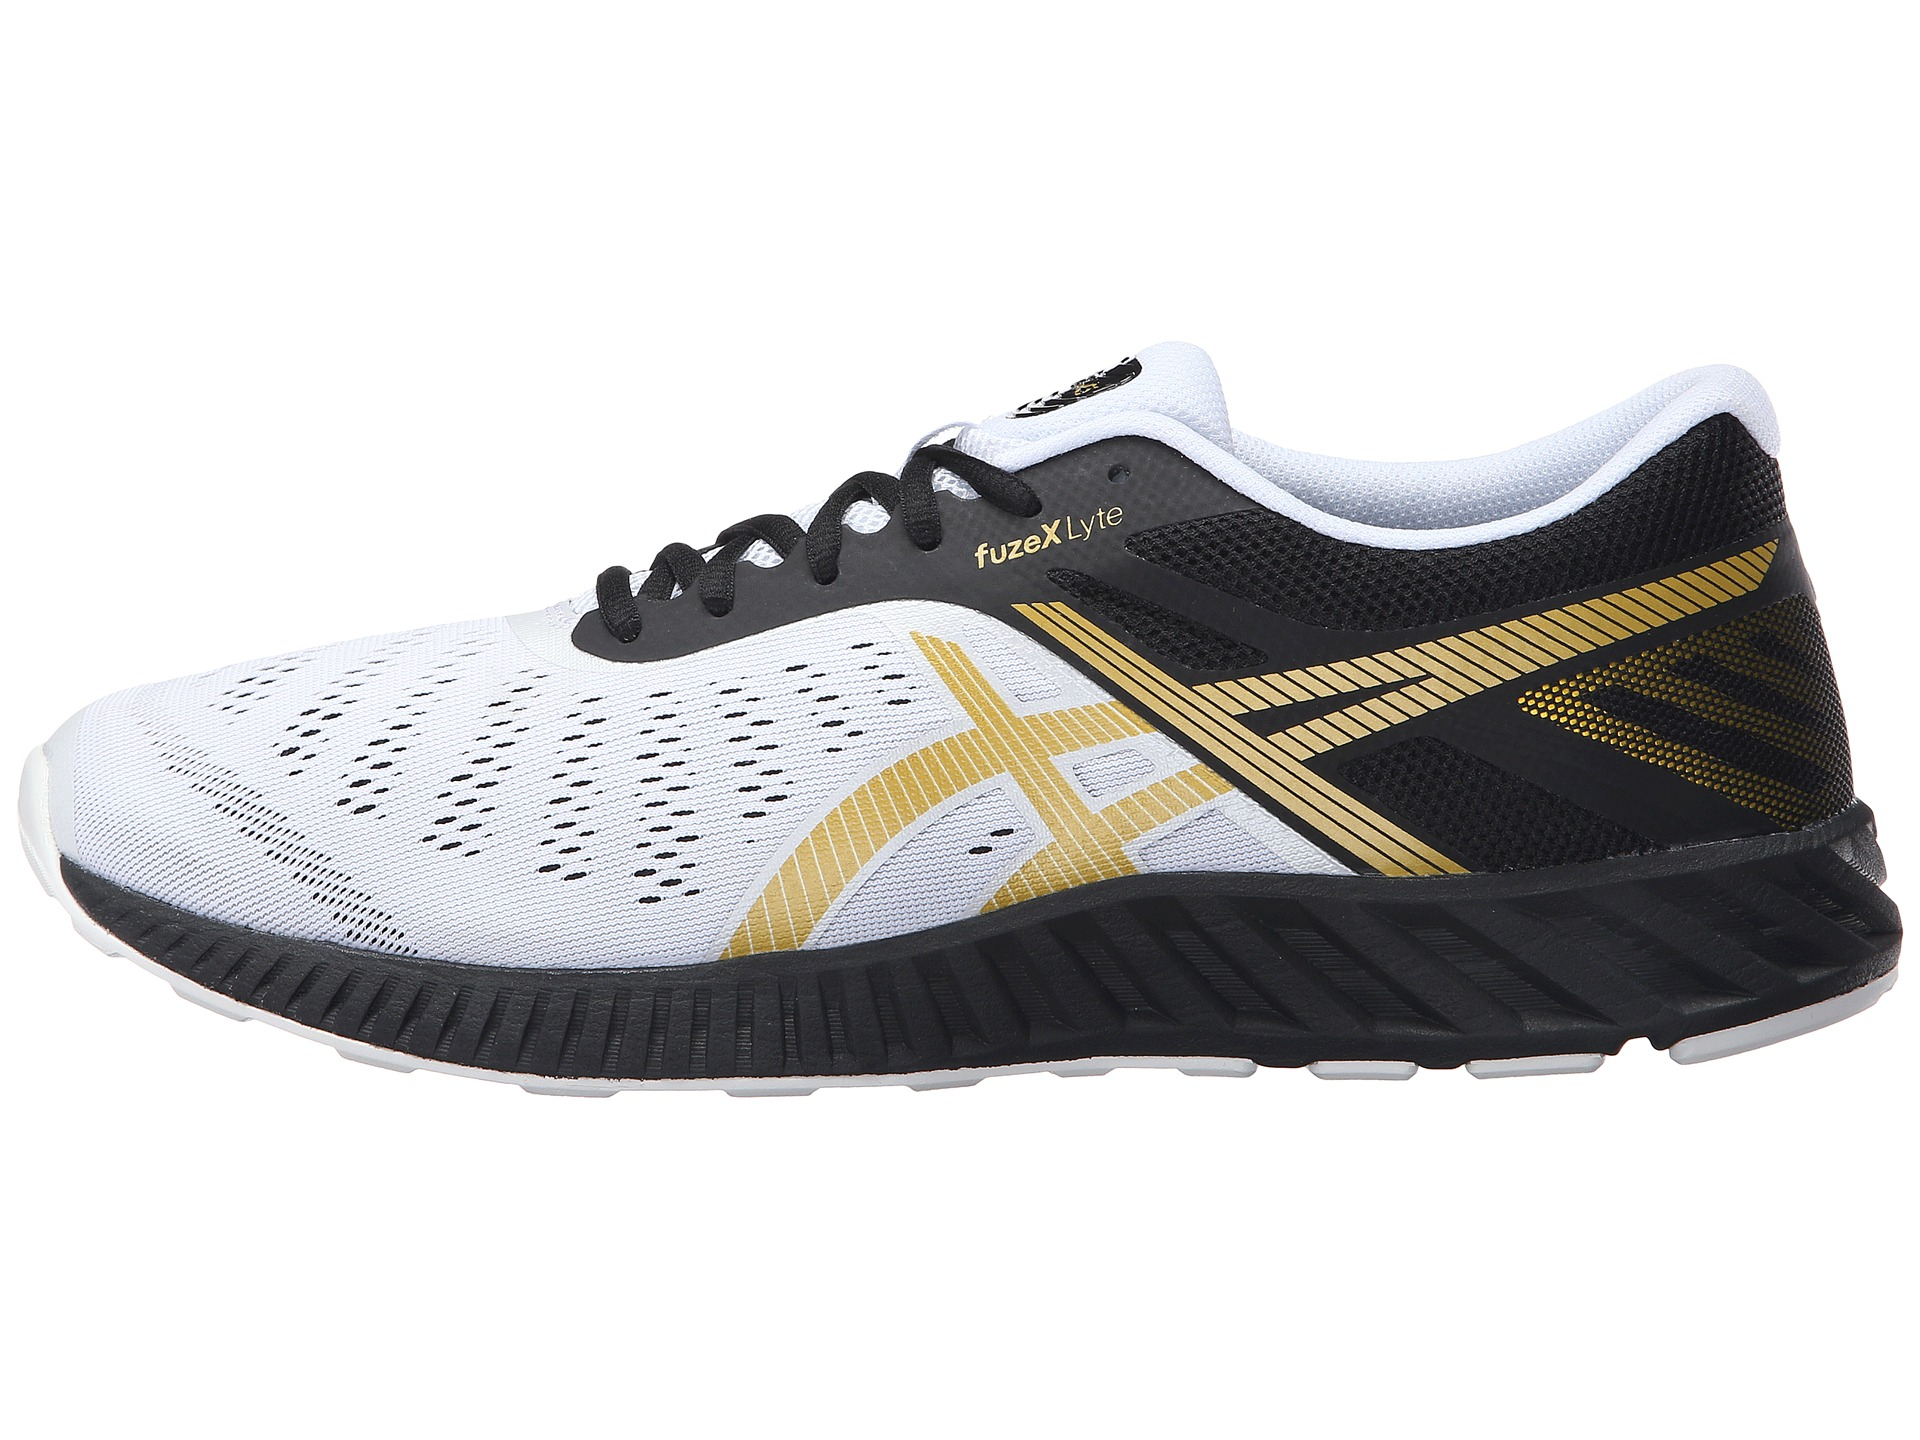 Asics Fuzex Lyte Men S Shoes Gray White Coral